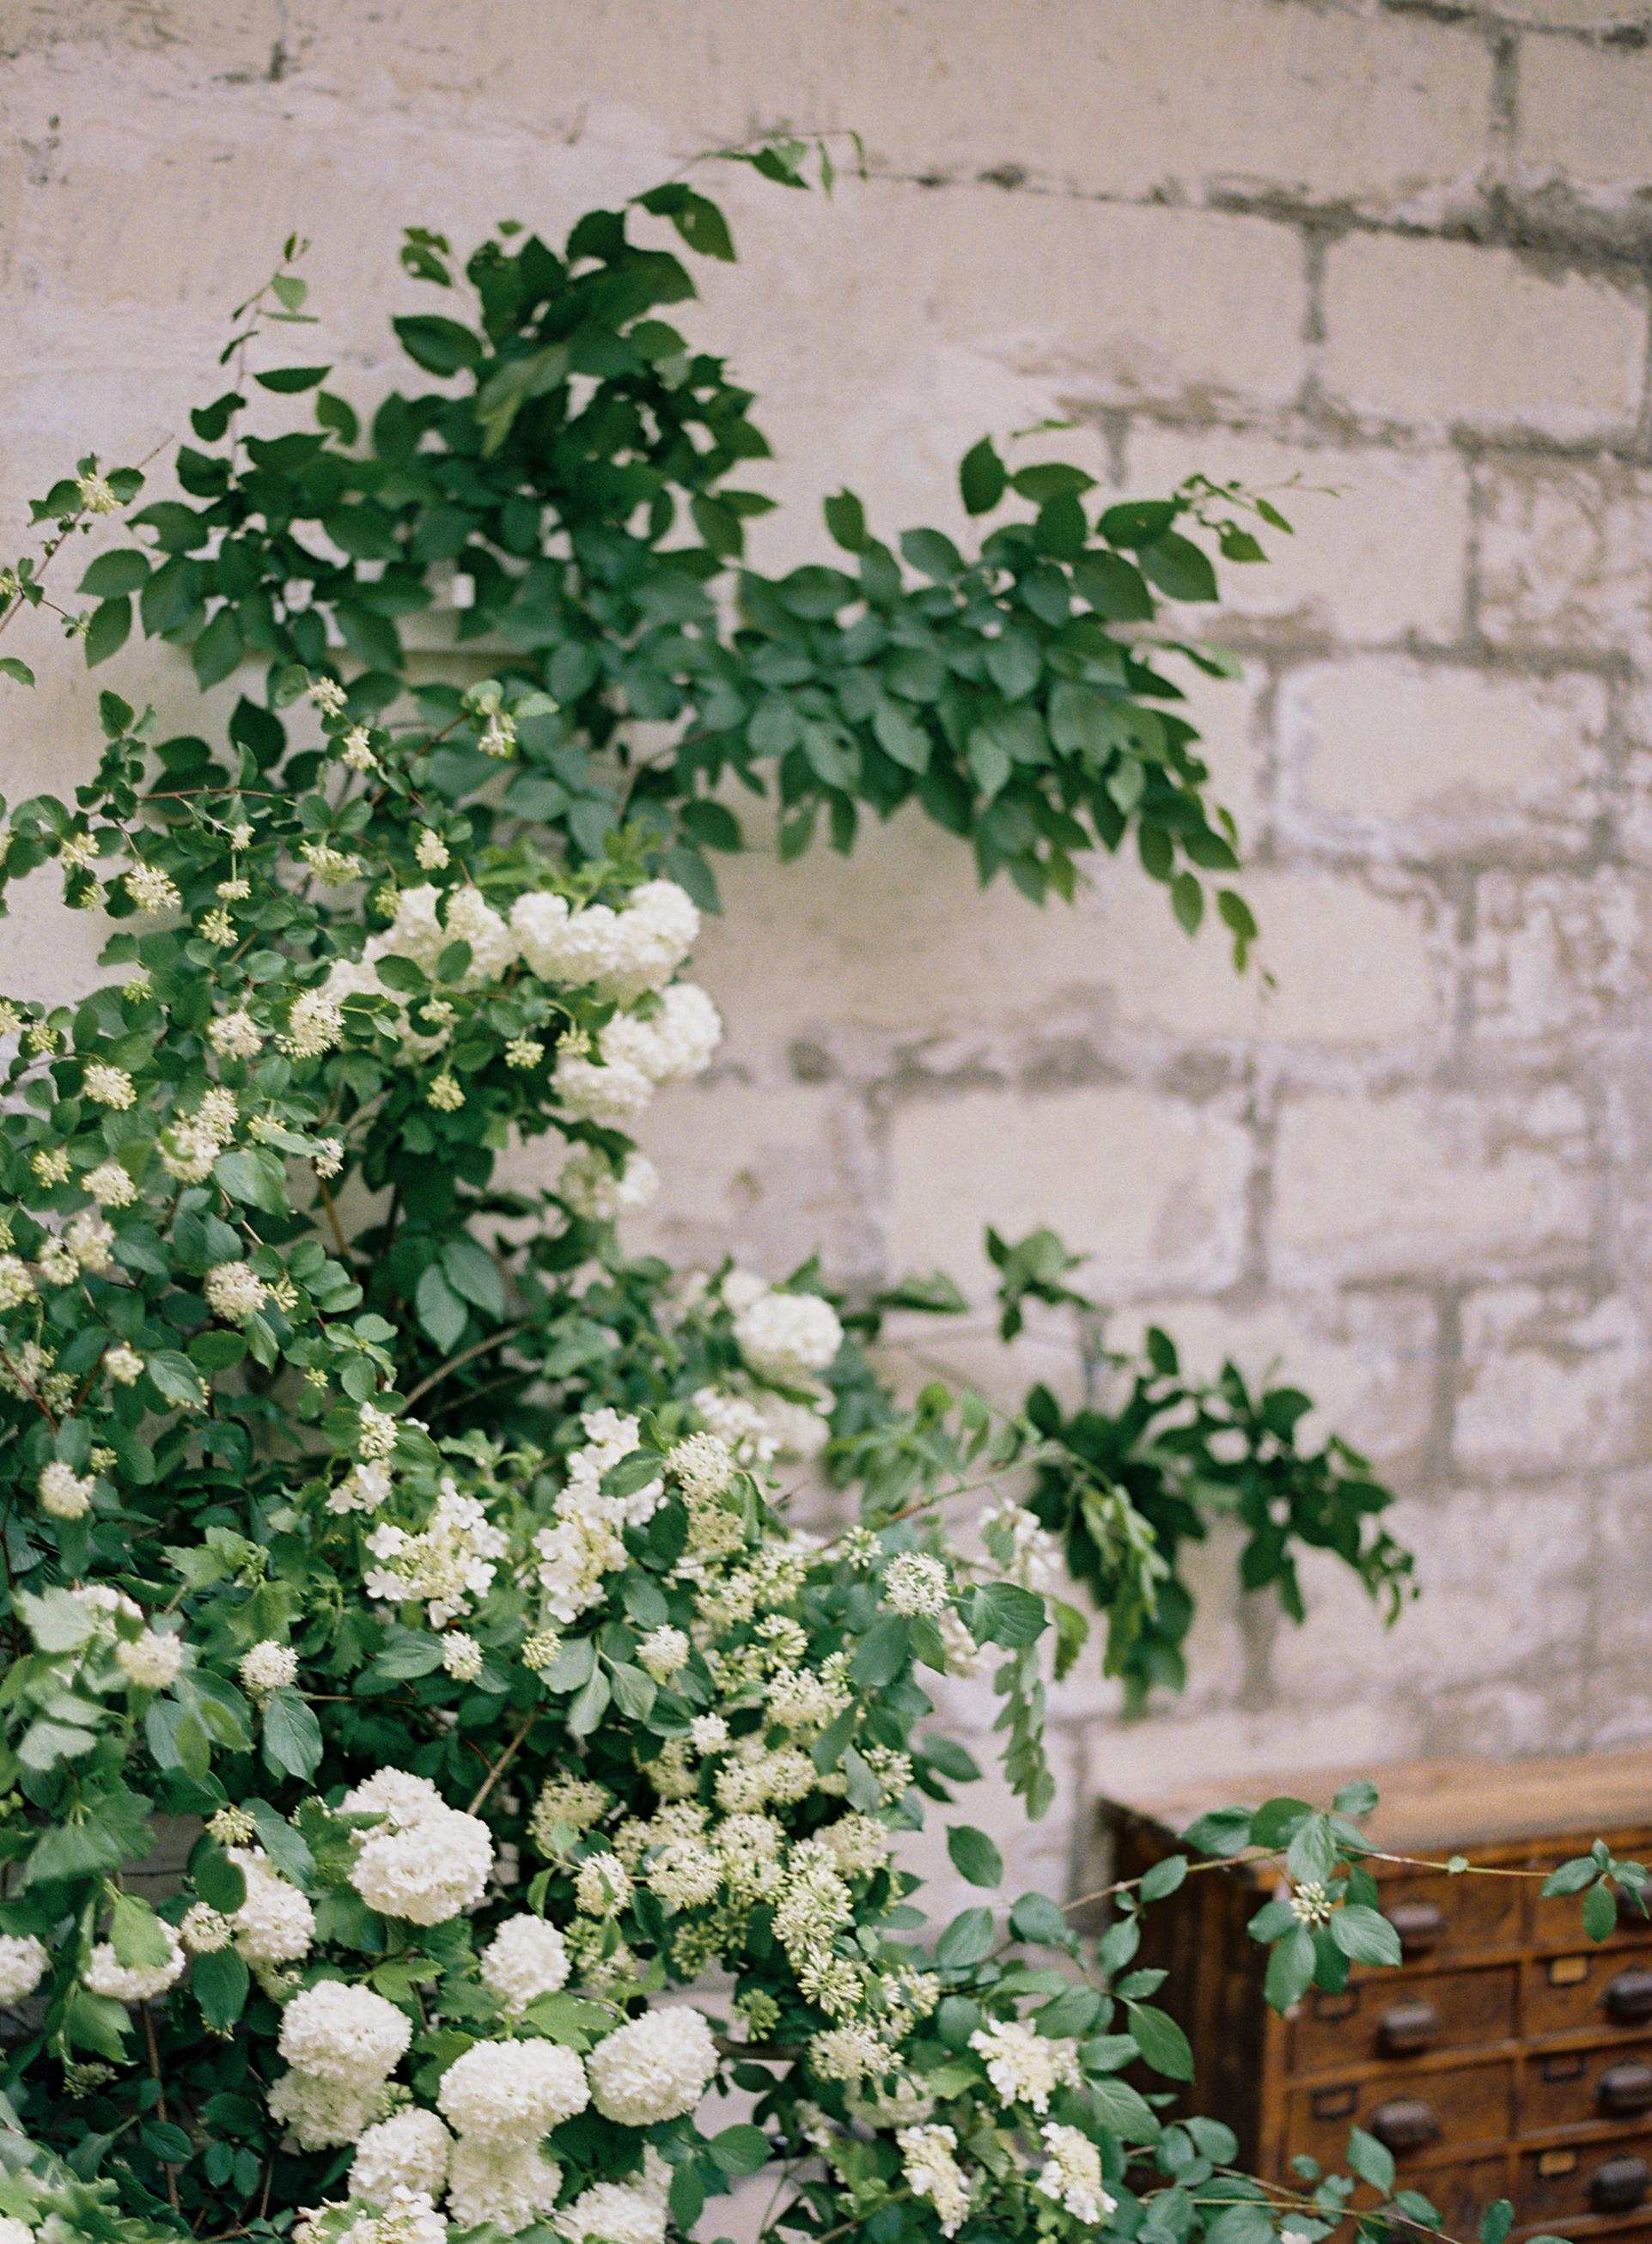 Floresie-Carrie King photographer-28.jpg